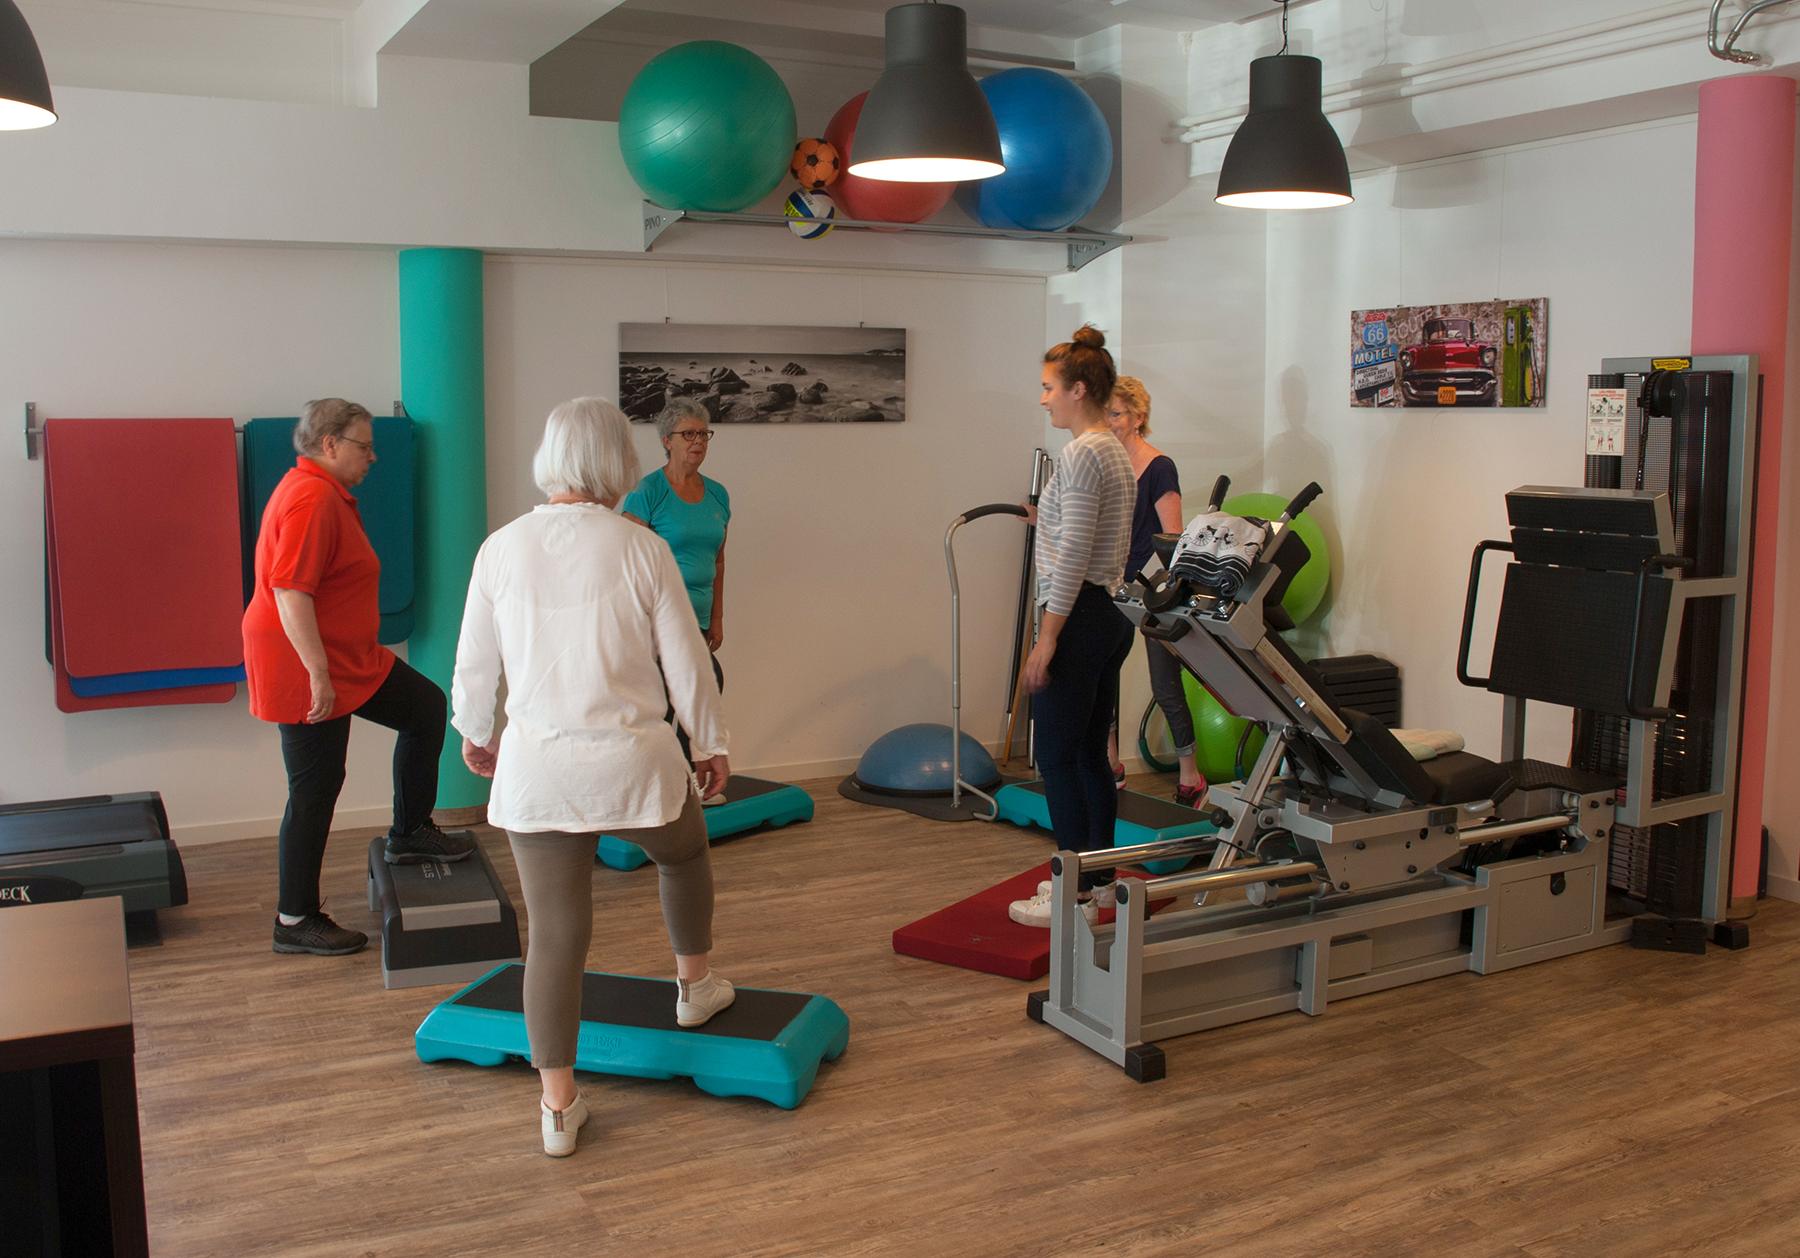 fysiotherapie-stadhoudersplein-wassenaar-training